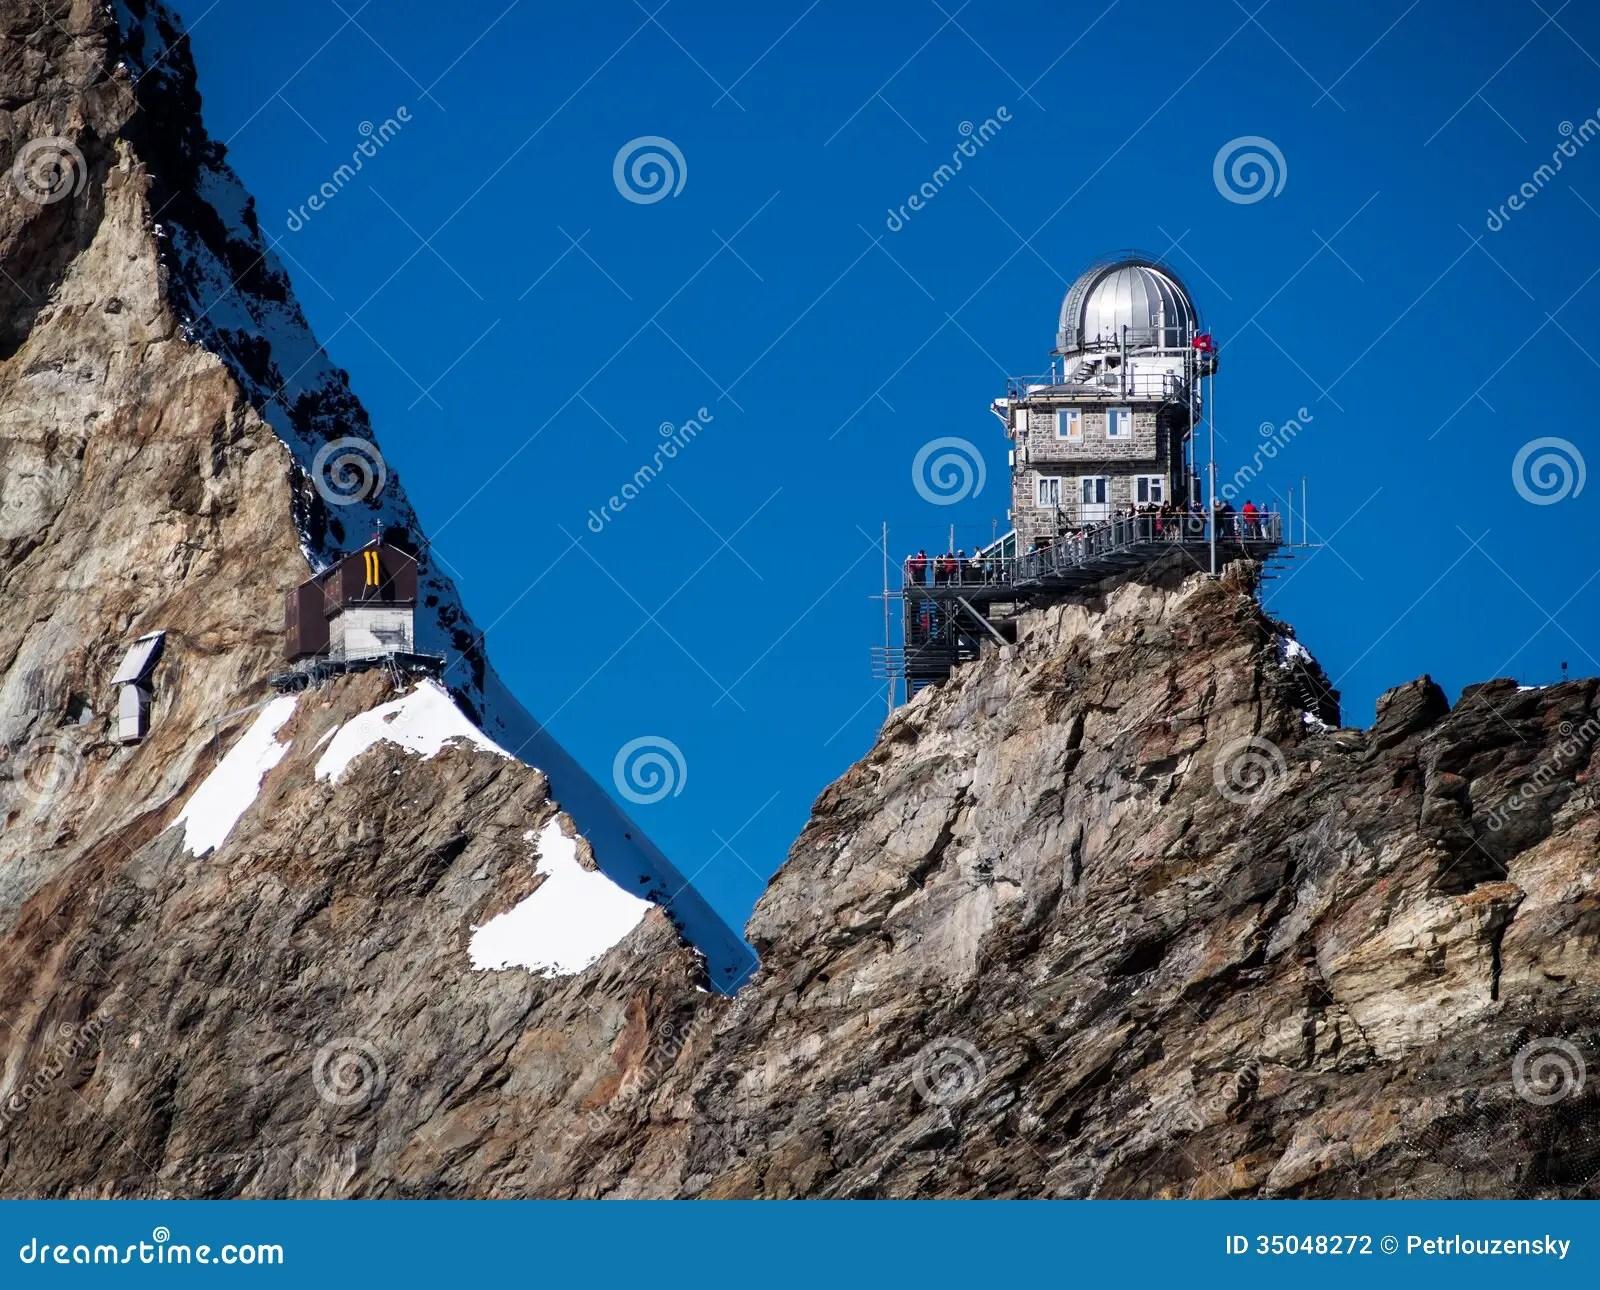 Blue Tattoo Ridge Range Mountain